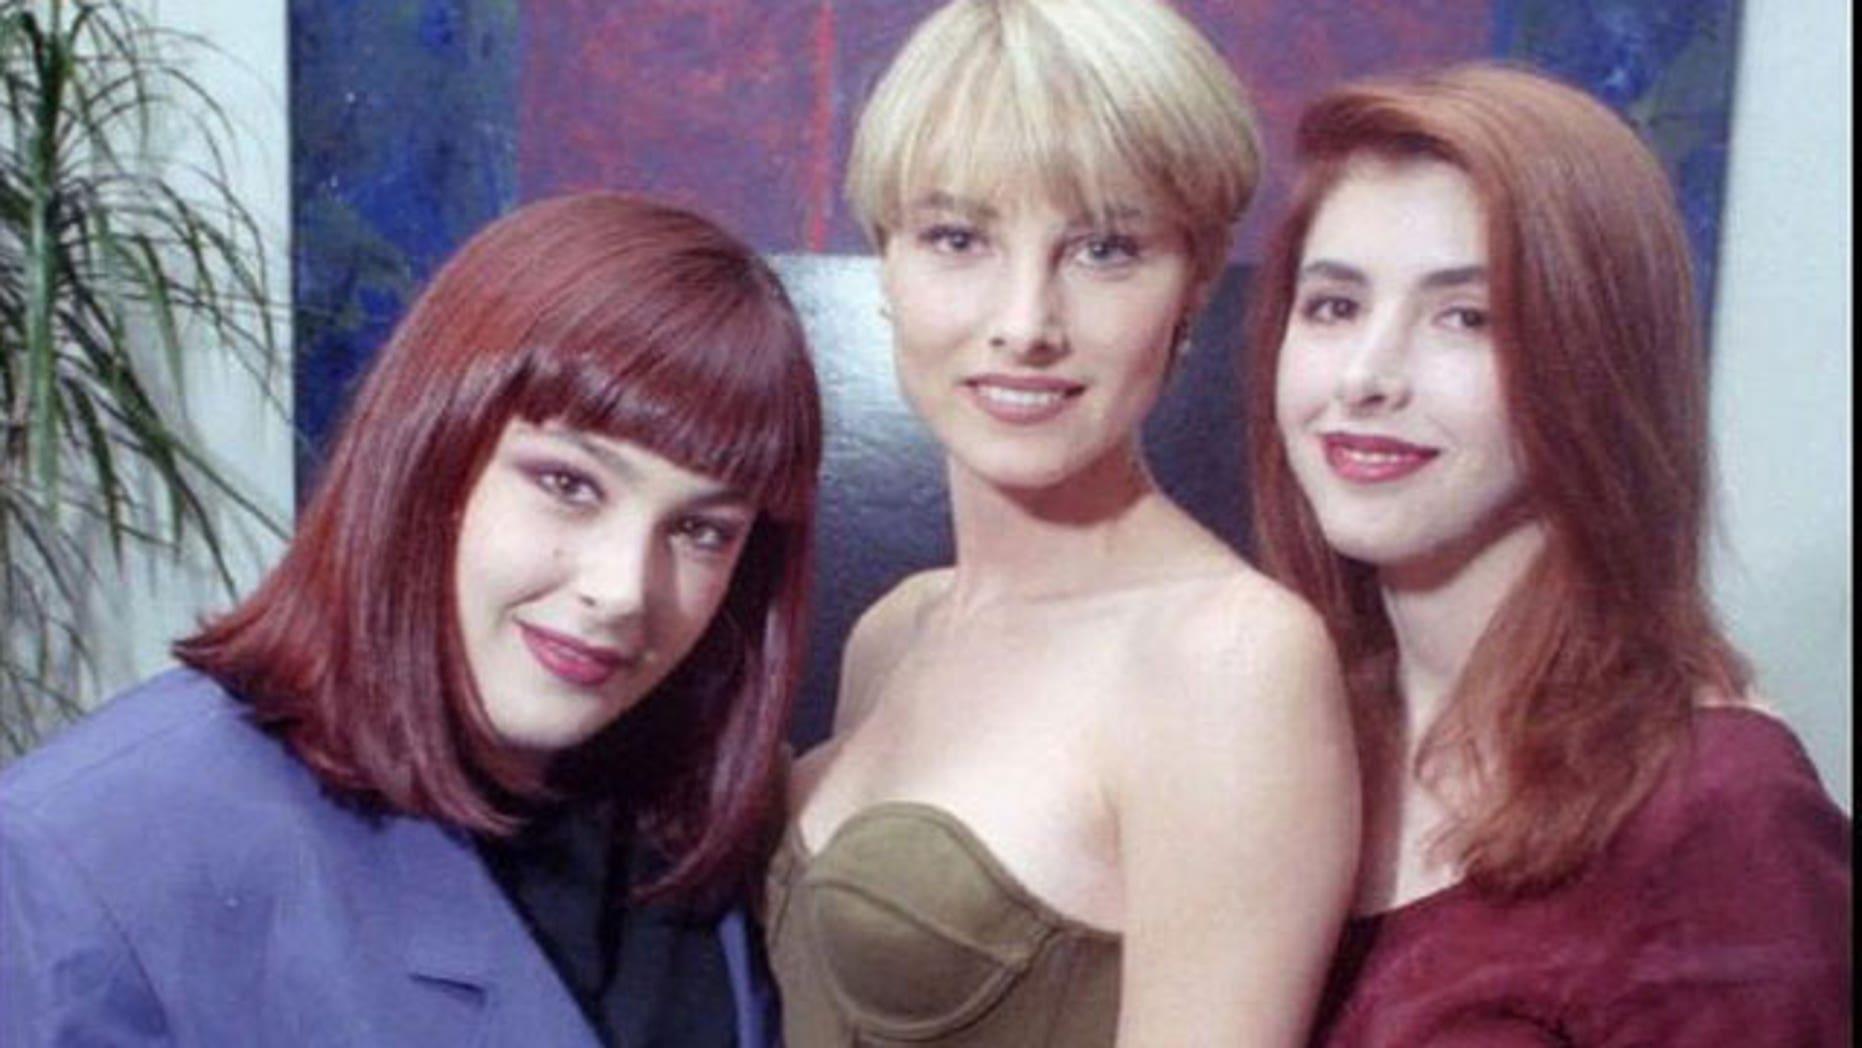 Carnie Wilson, Chyna Phillips and Wendy Wilson